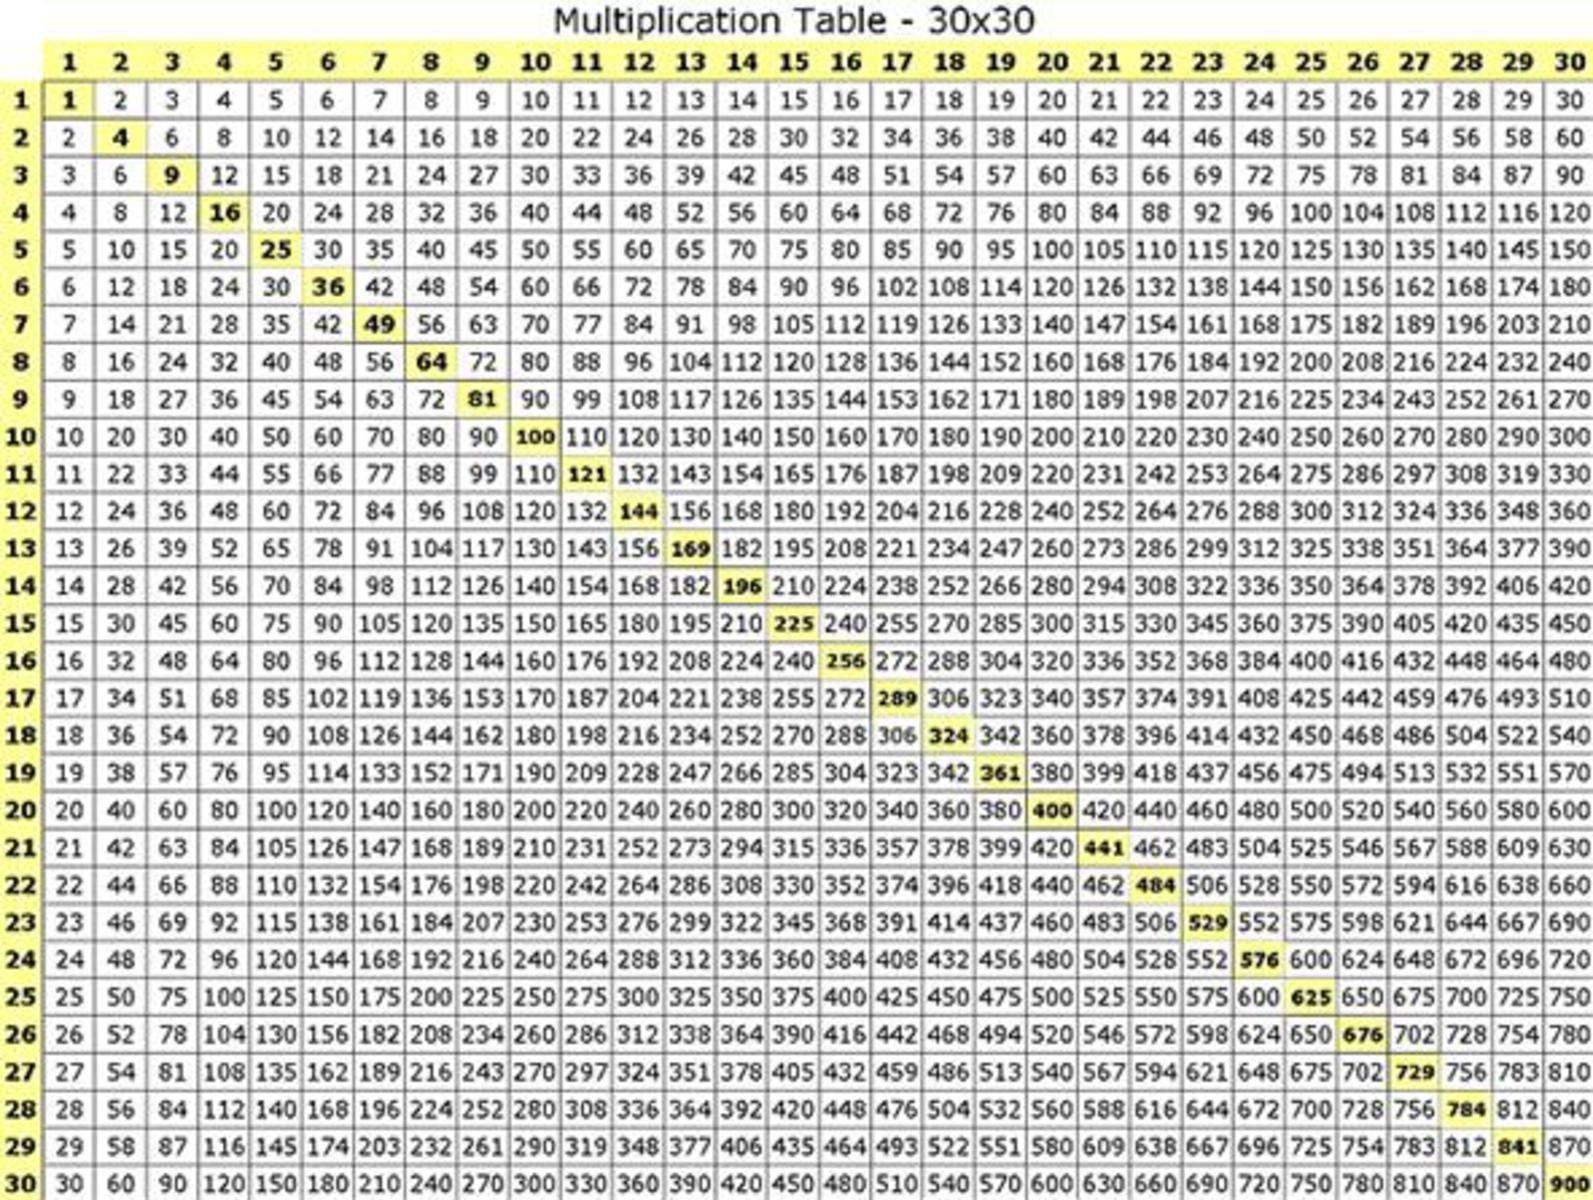 Large Multiplication Table 2 , Large Multiplication Table for Printable Multiplication Table 50X50